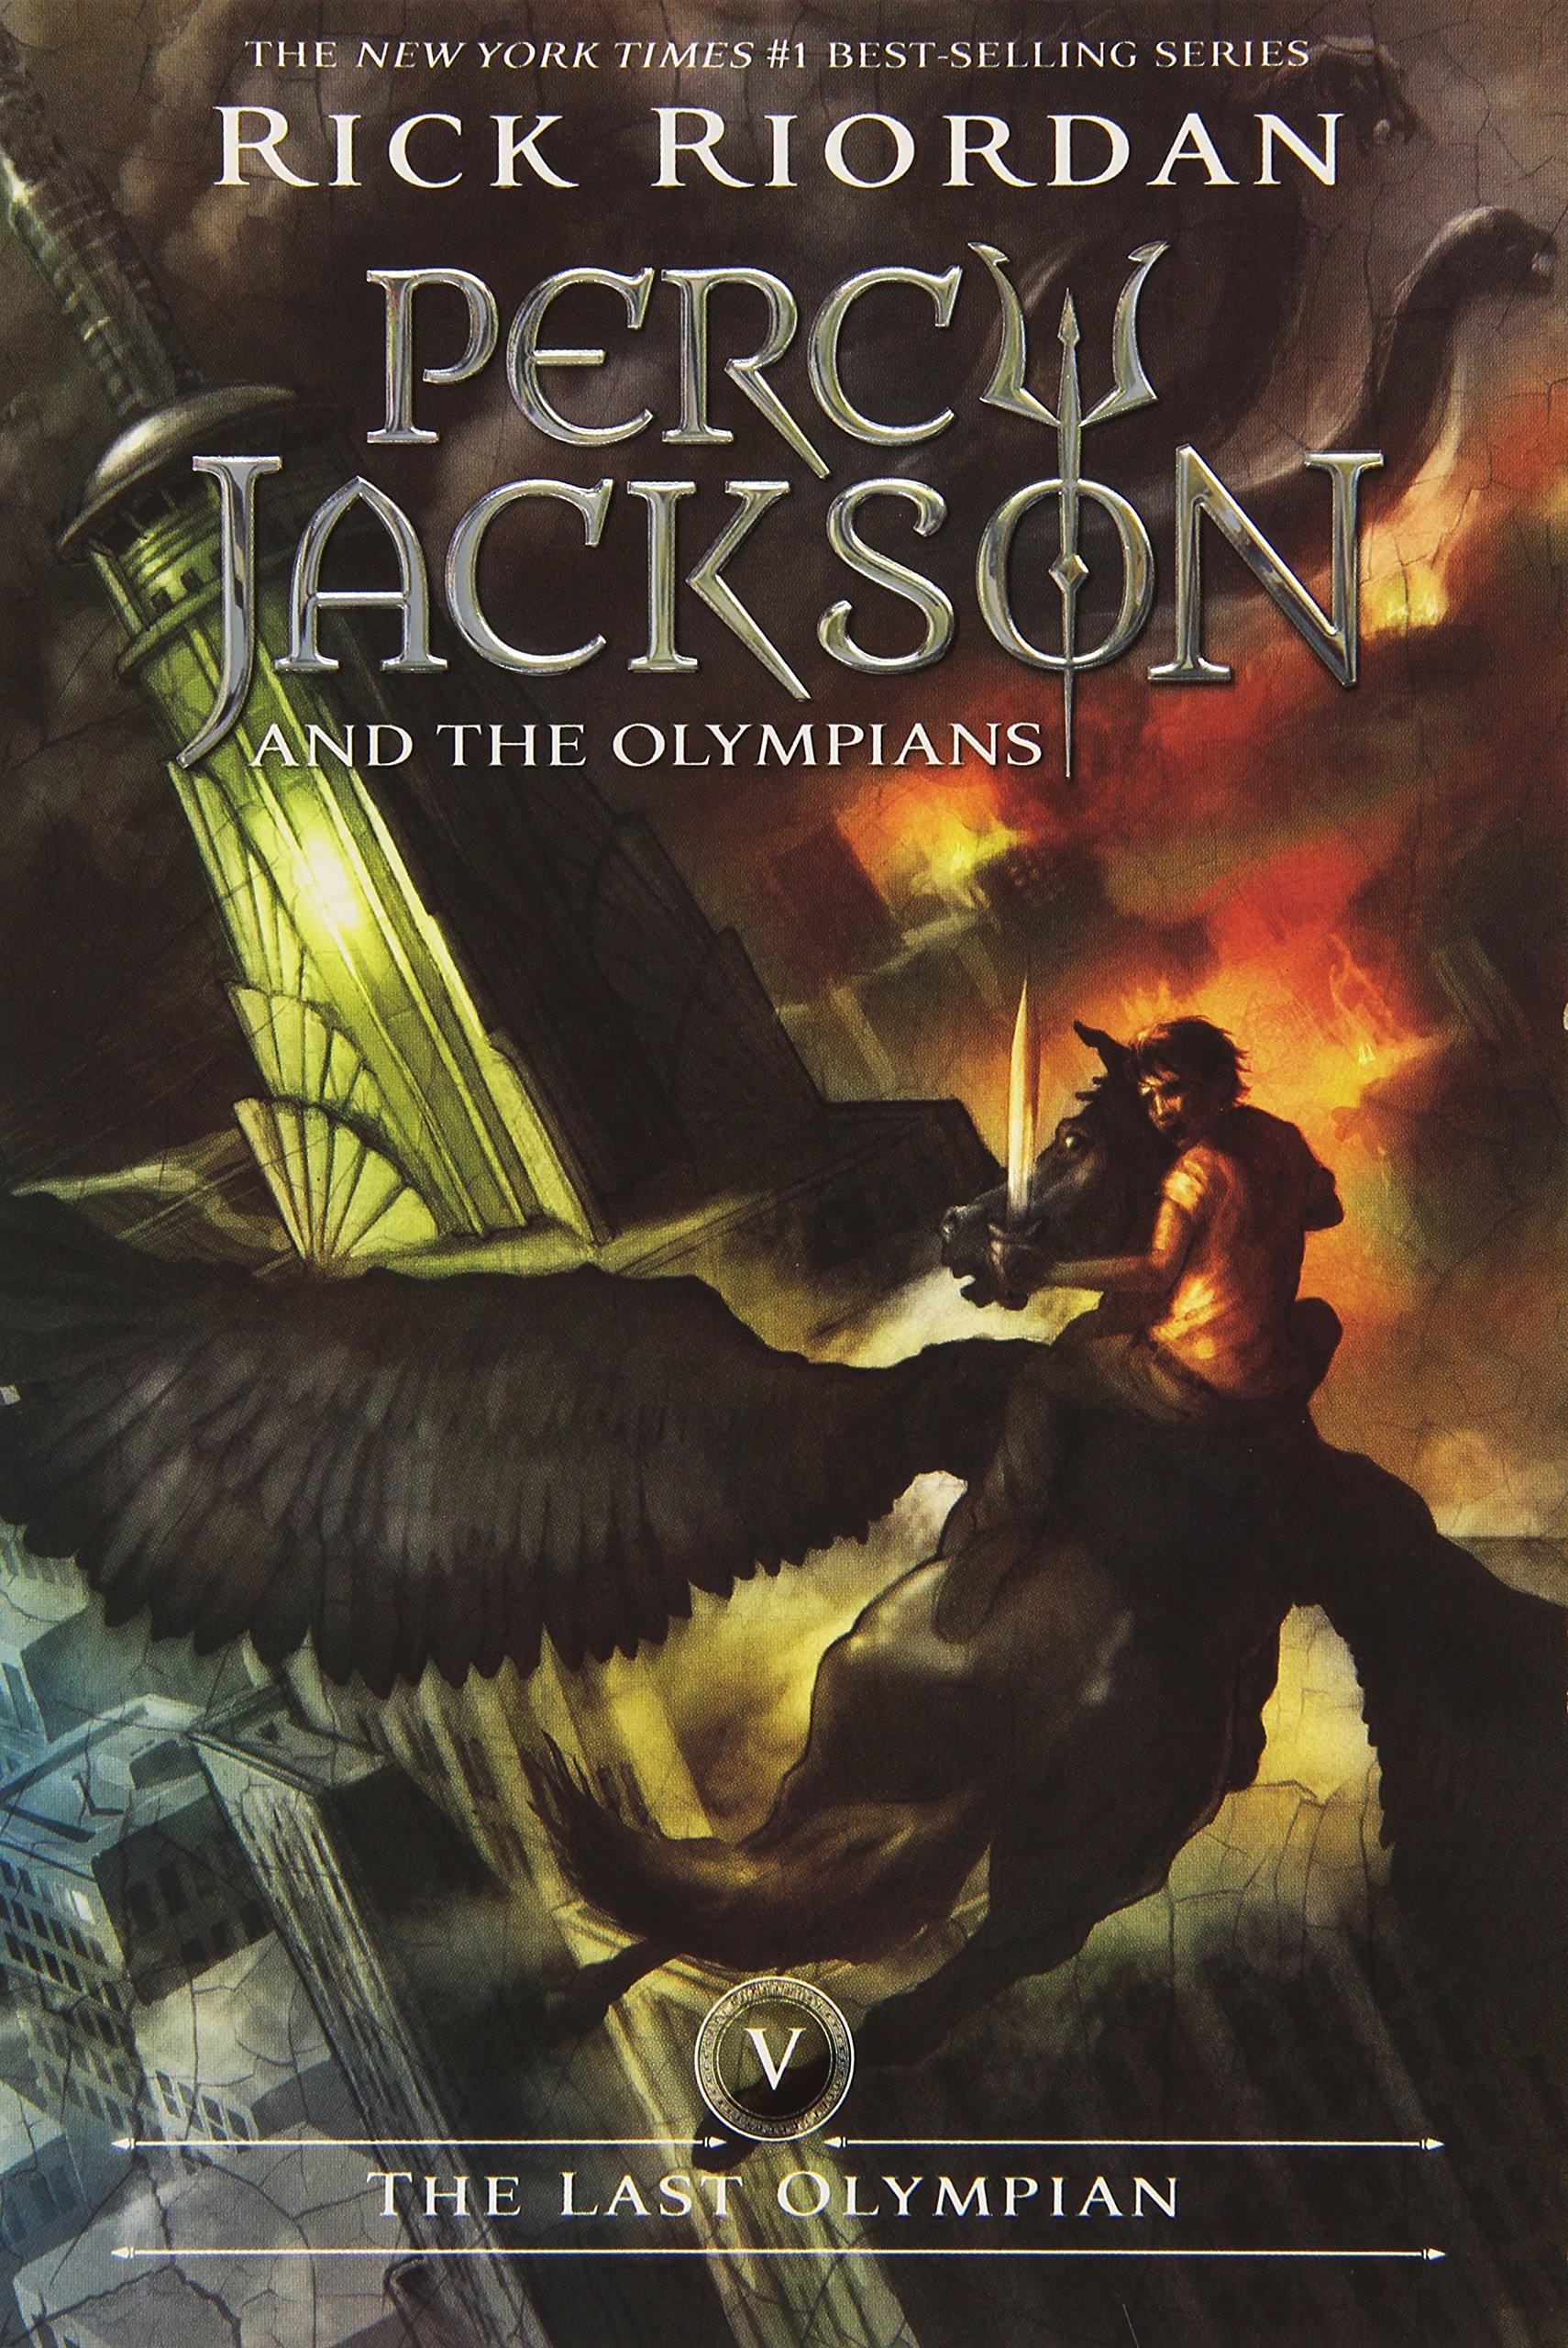 com the last olympian percy jackson and the olympians  com the last olympian percy jackson and the olympians book 5 9781423101505 rick riordan books